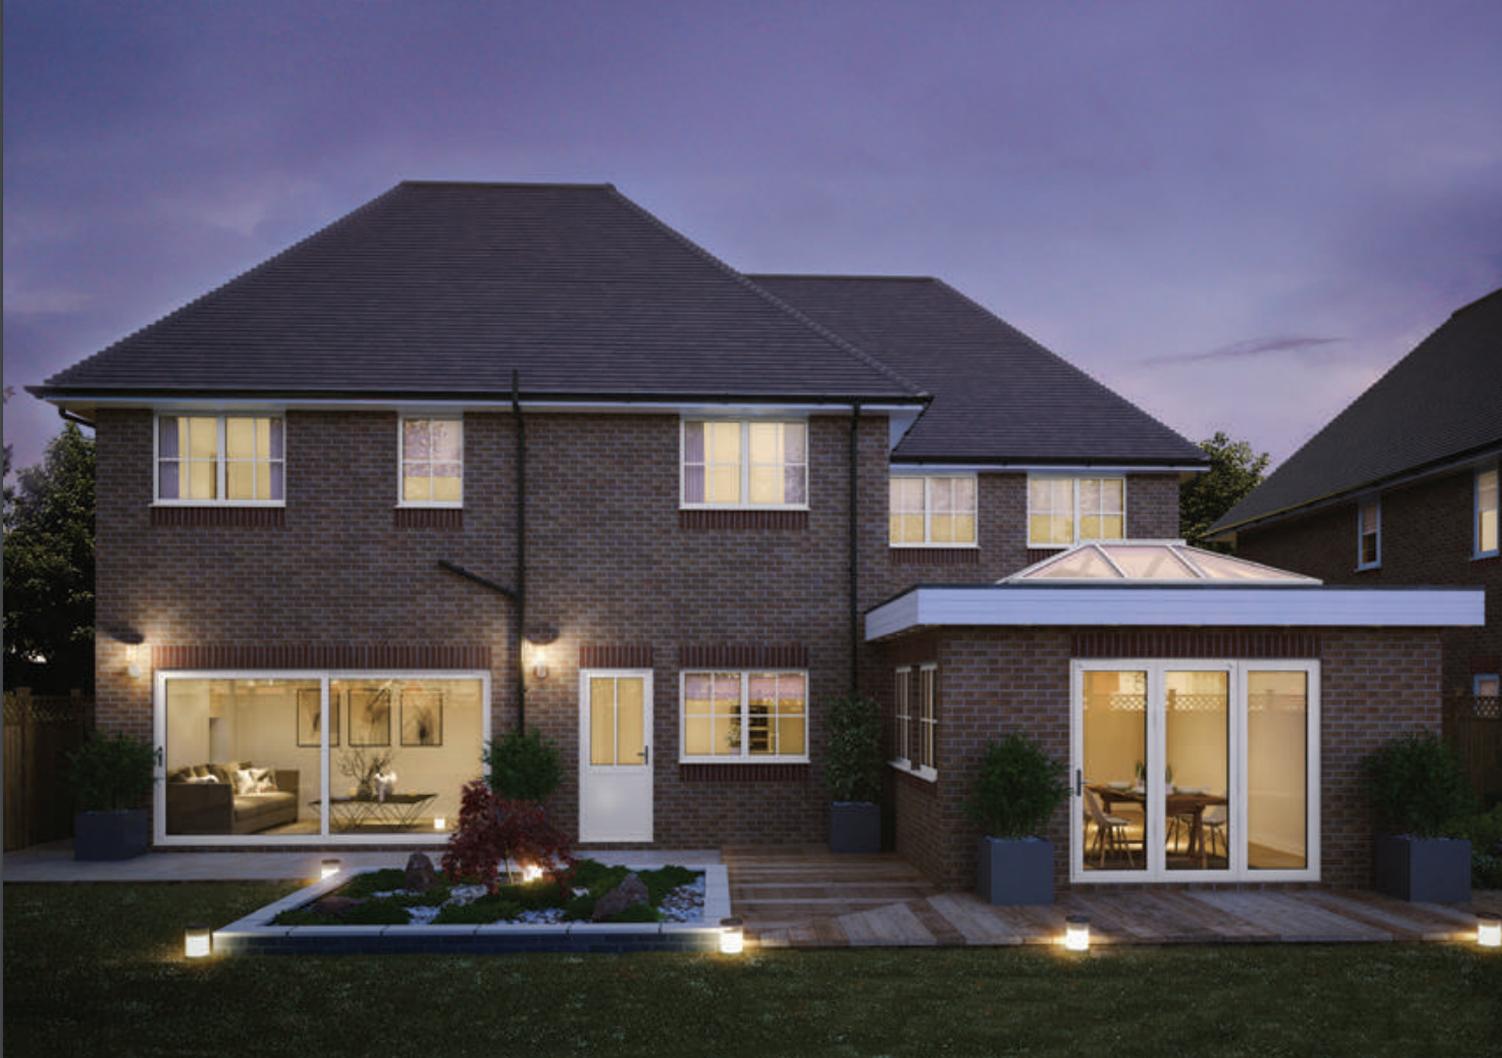 House with illuminated Aluminium windows